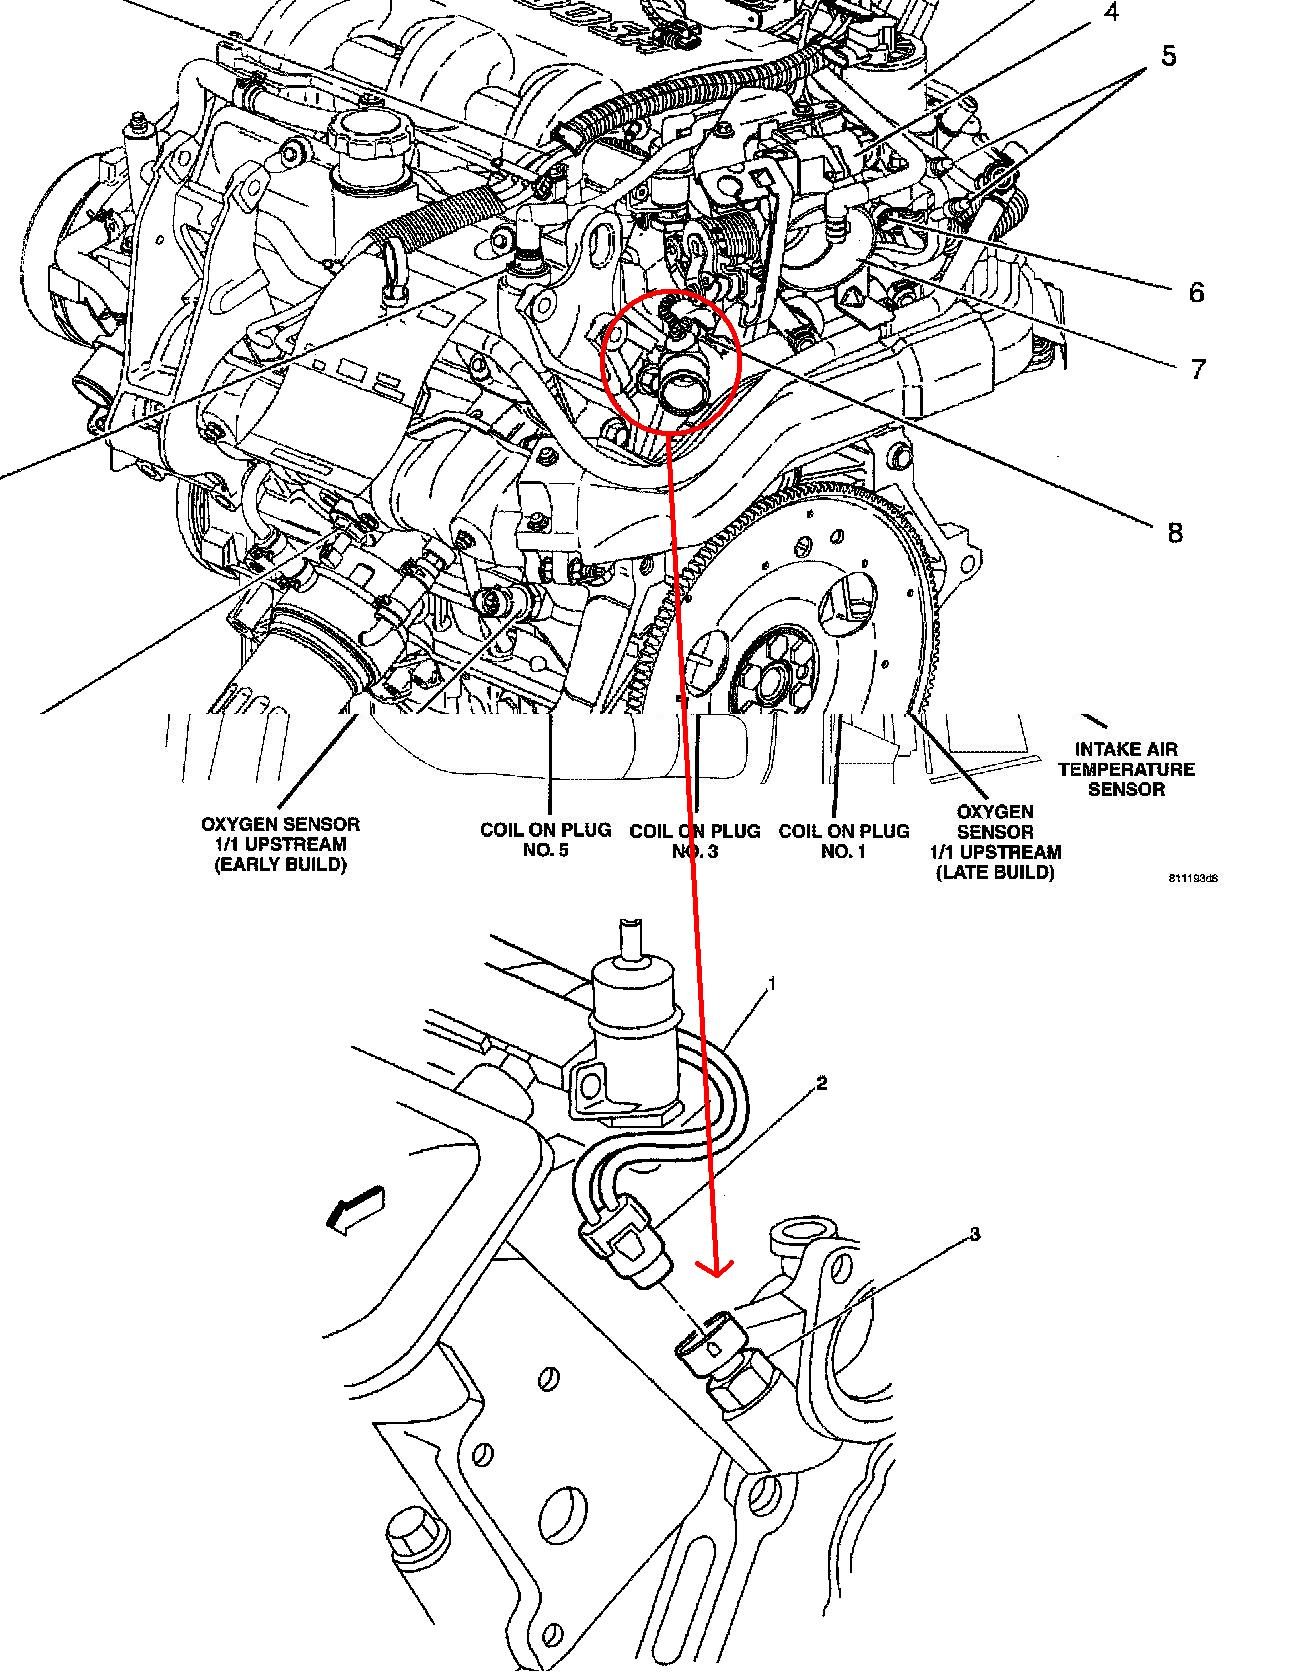 Chevy Cavalier Repair Manual 2003 Coolant System 849620 Salonurody 2000 Daewoo Engine Diagram